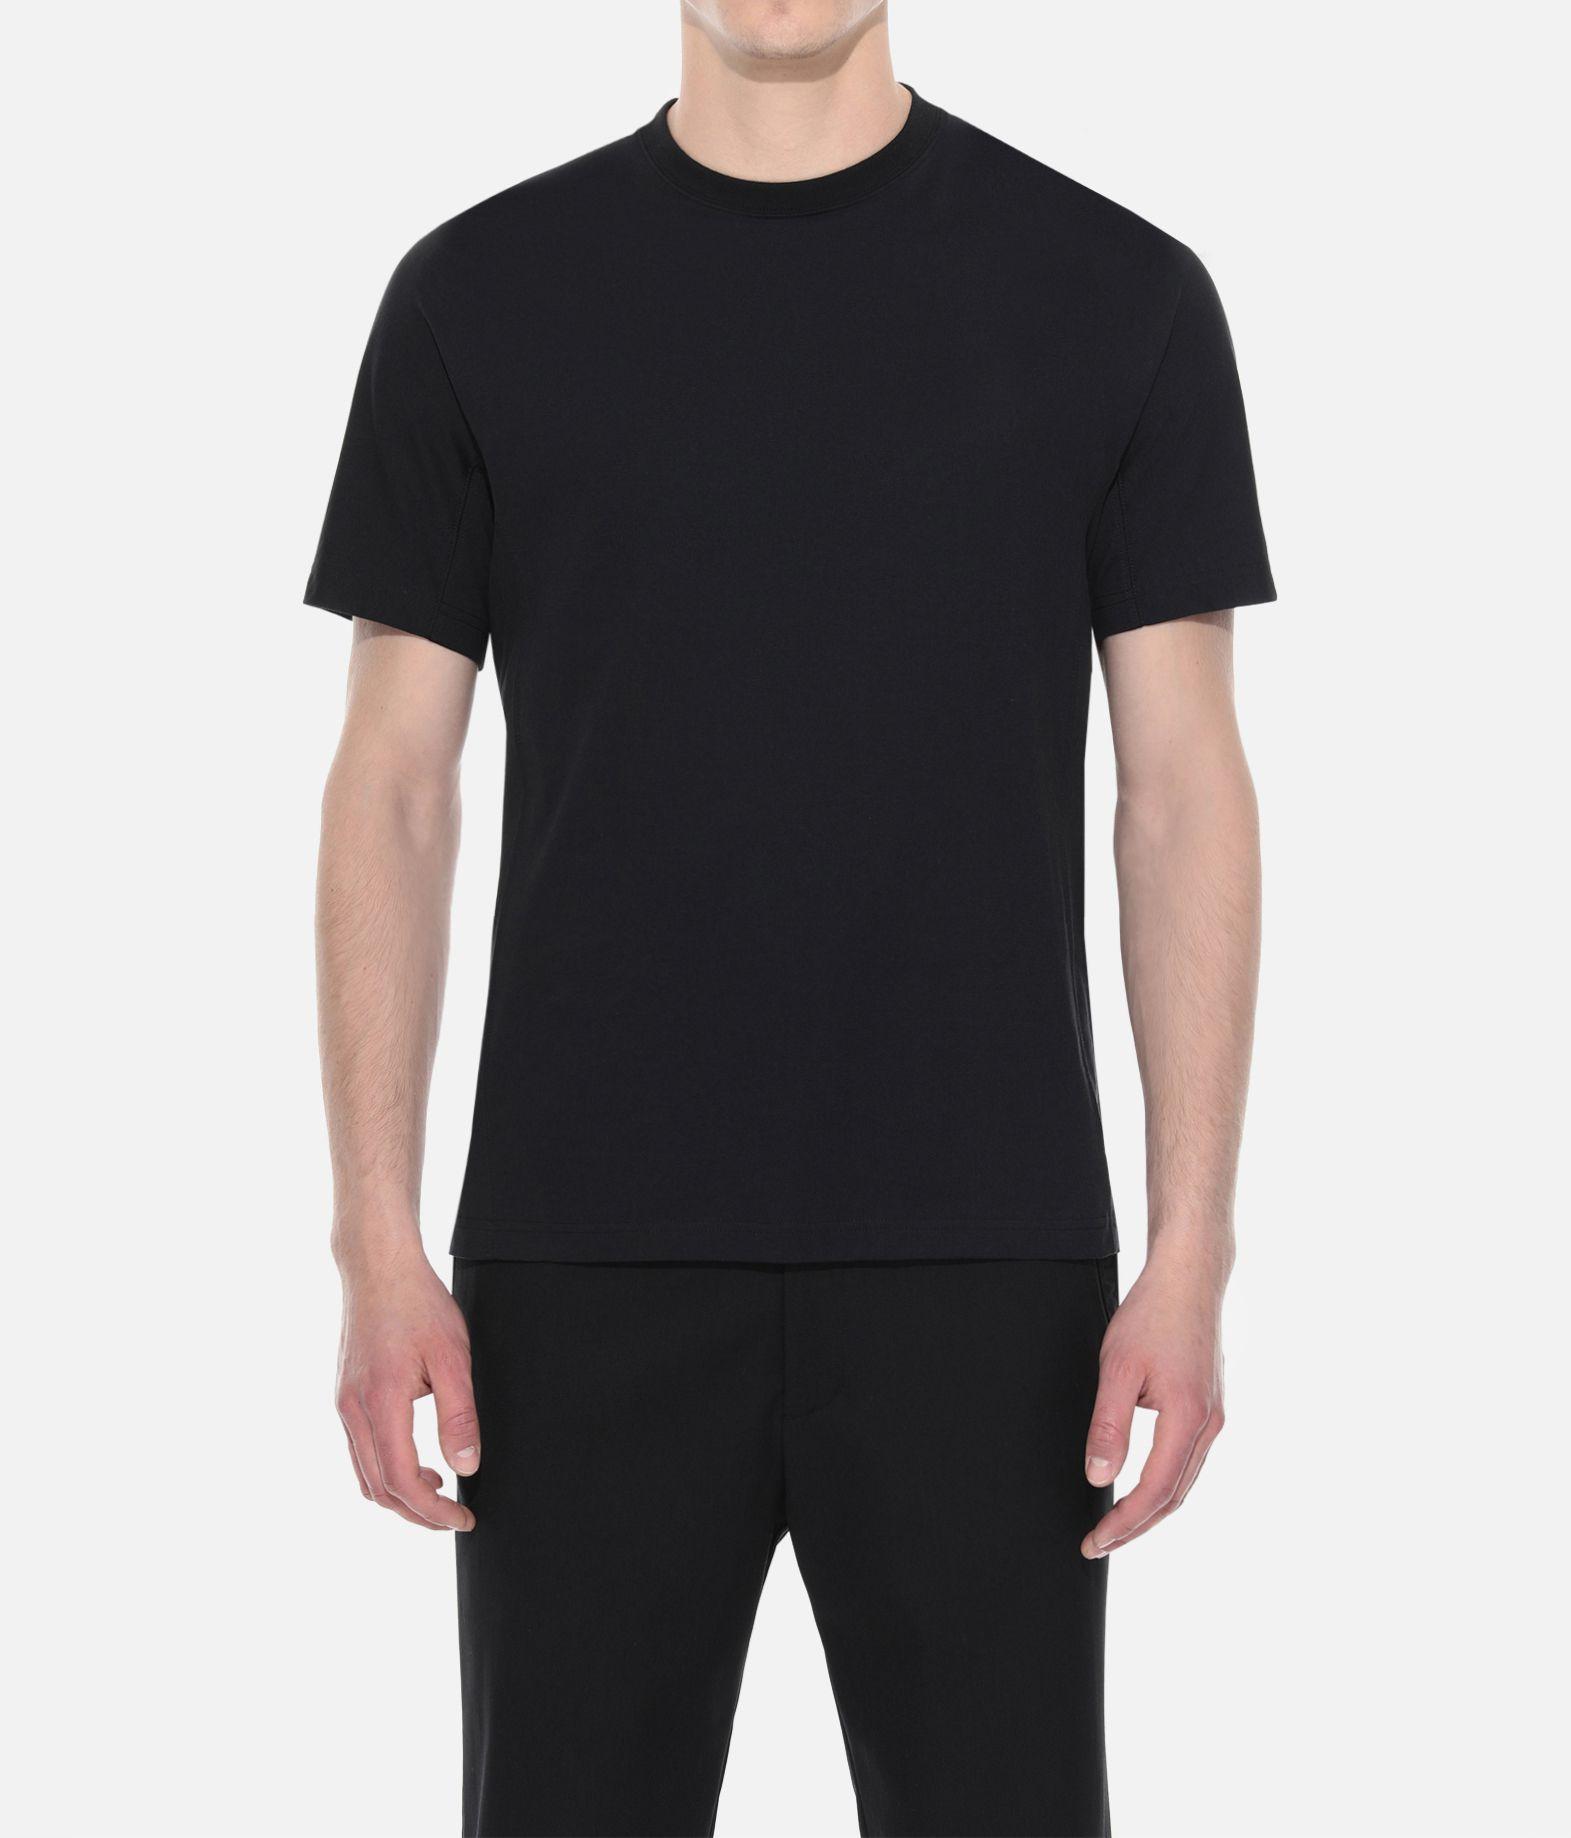 Y-3 Y-3 Classic Crewneck Tee Short sleeve t-shirt Man r